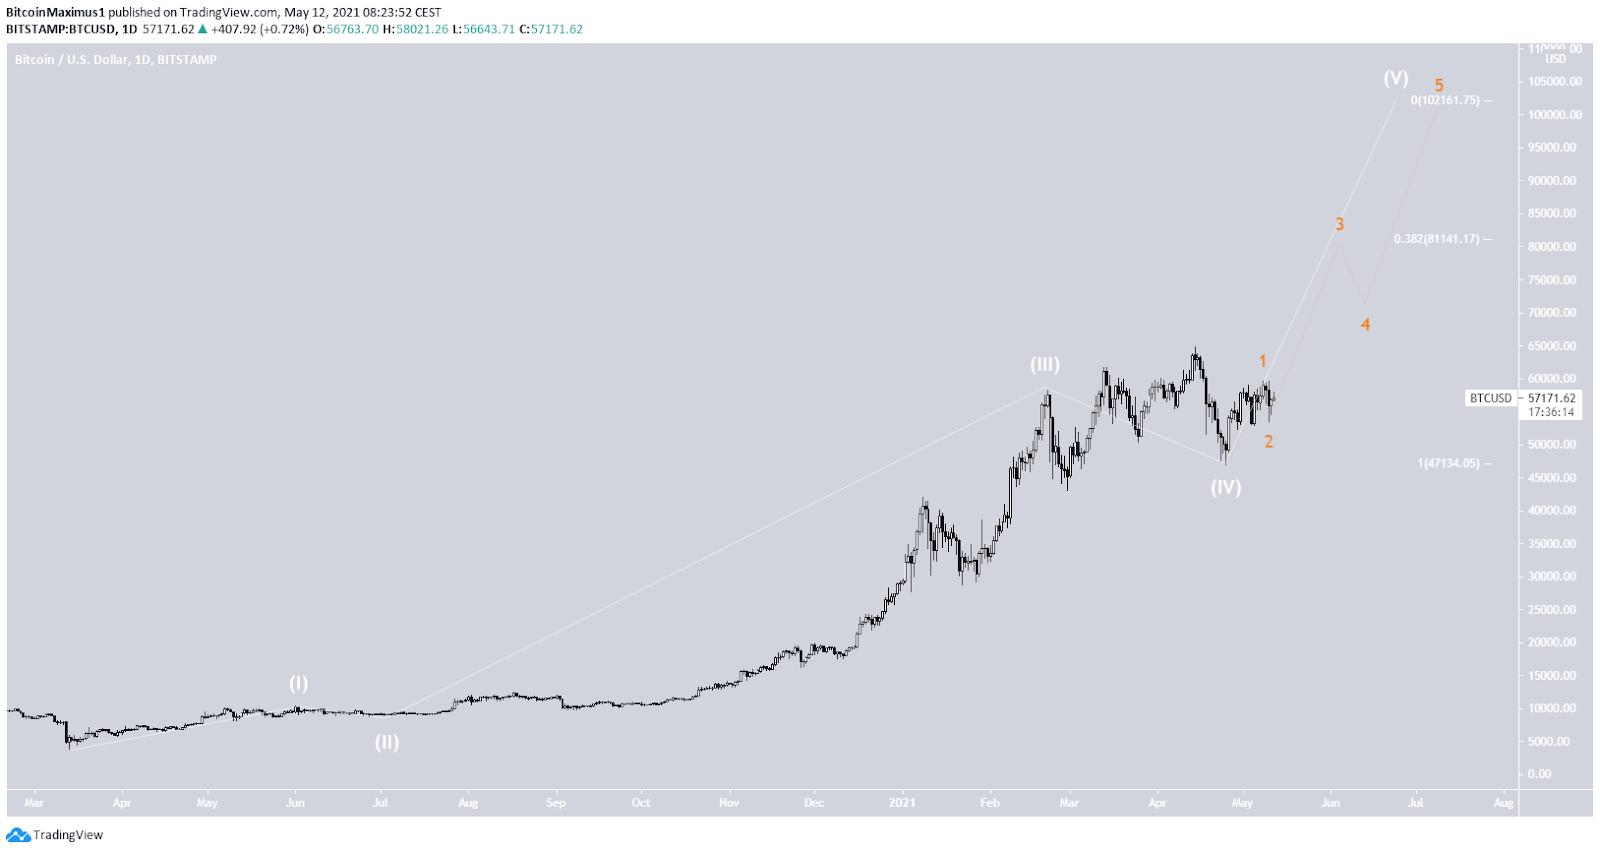 Bitcoin Kurs Wellenanalyse 12.05.2021 Preis Chart